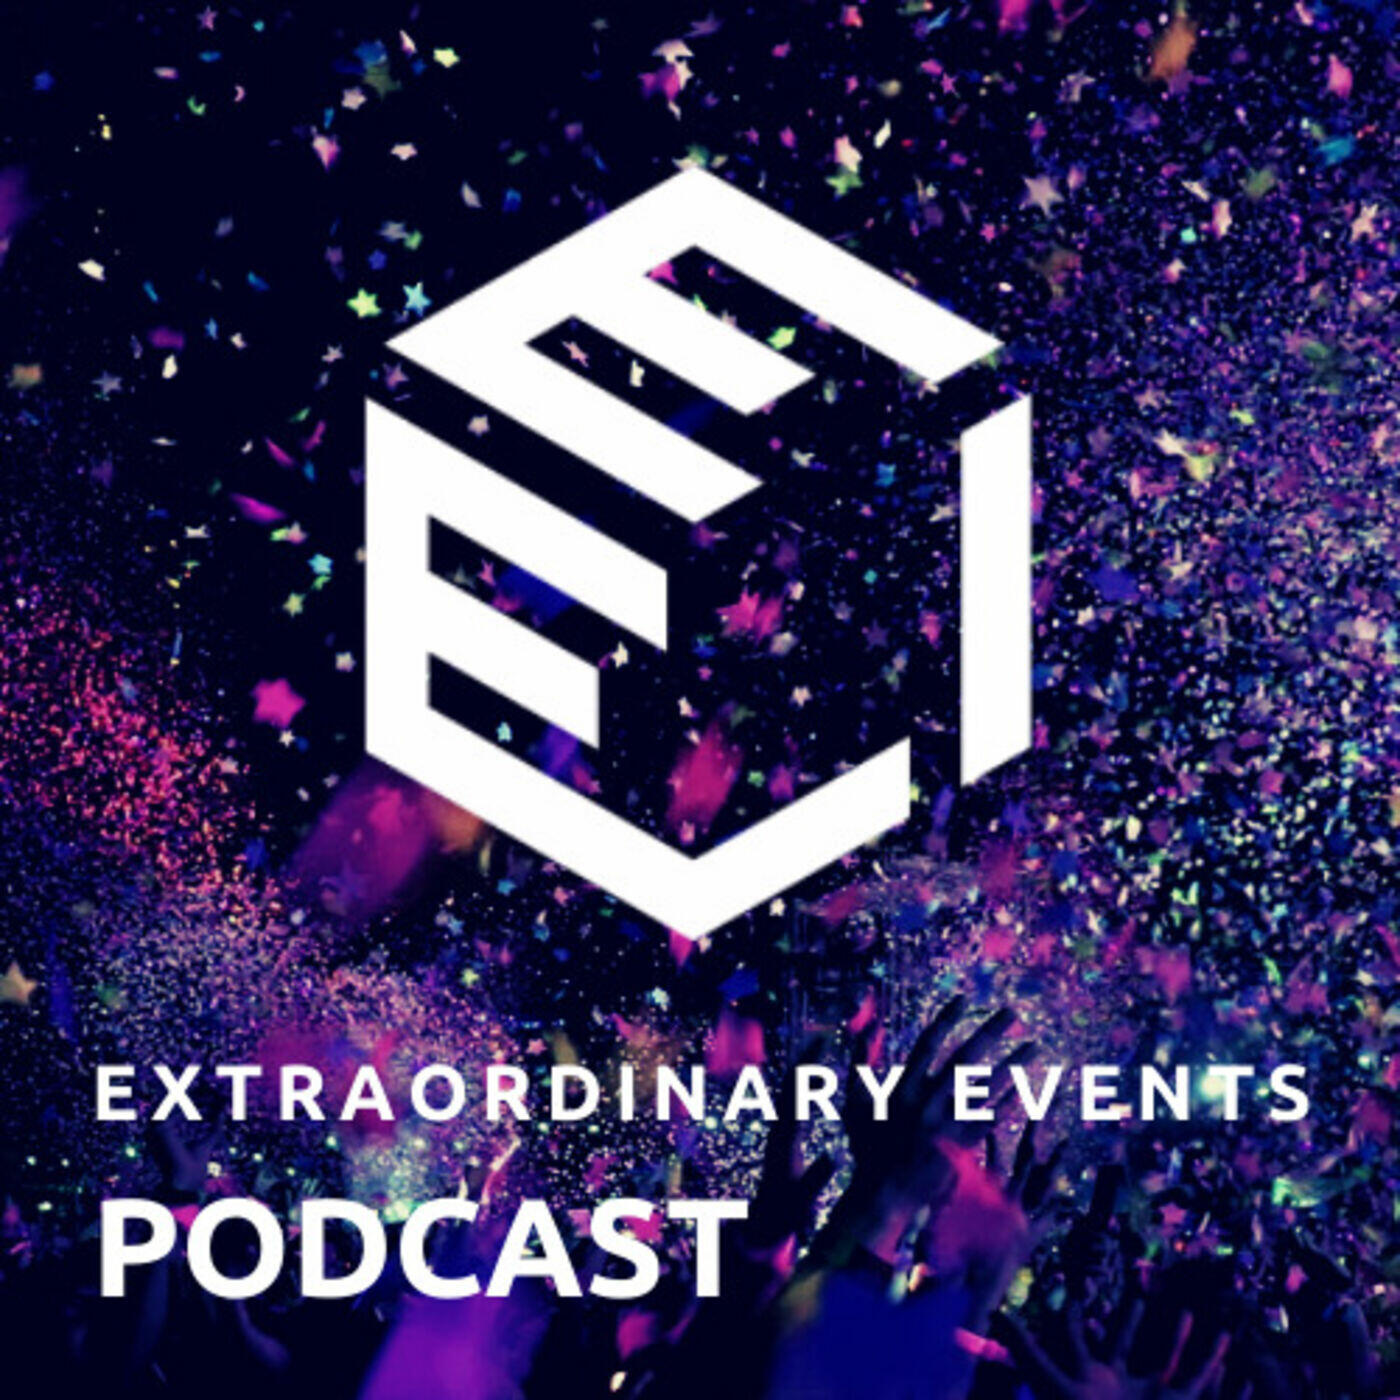 Extraordinary Events Podcast